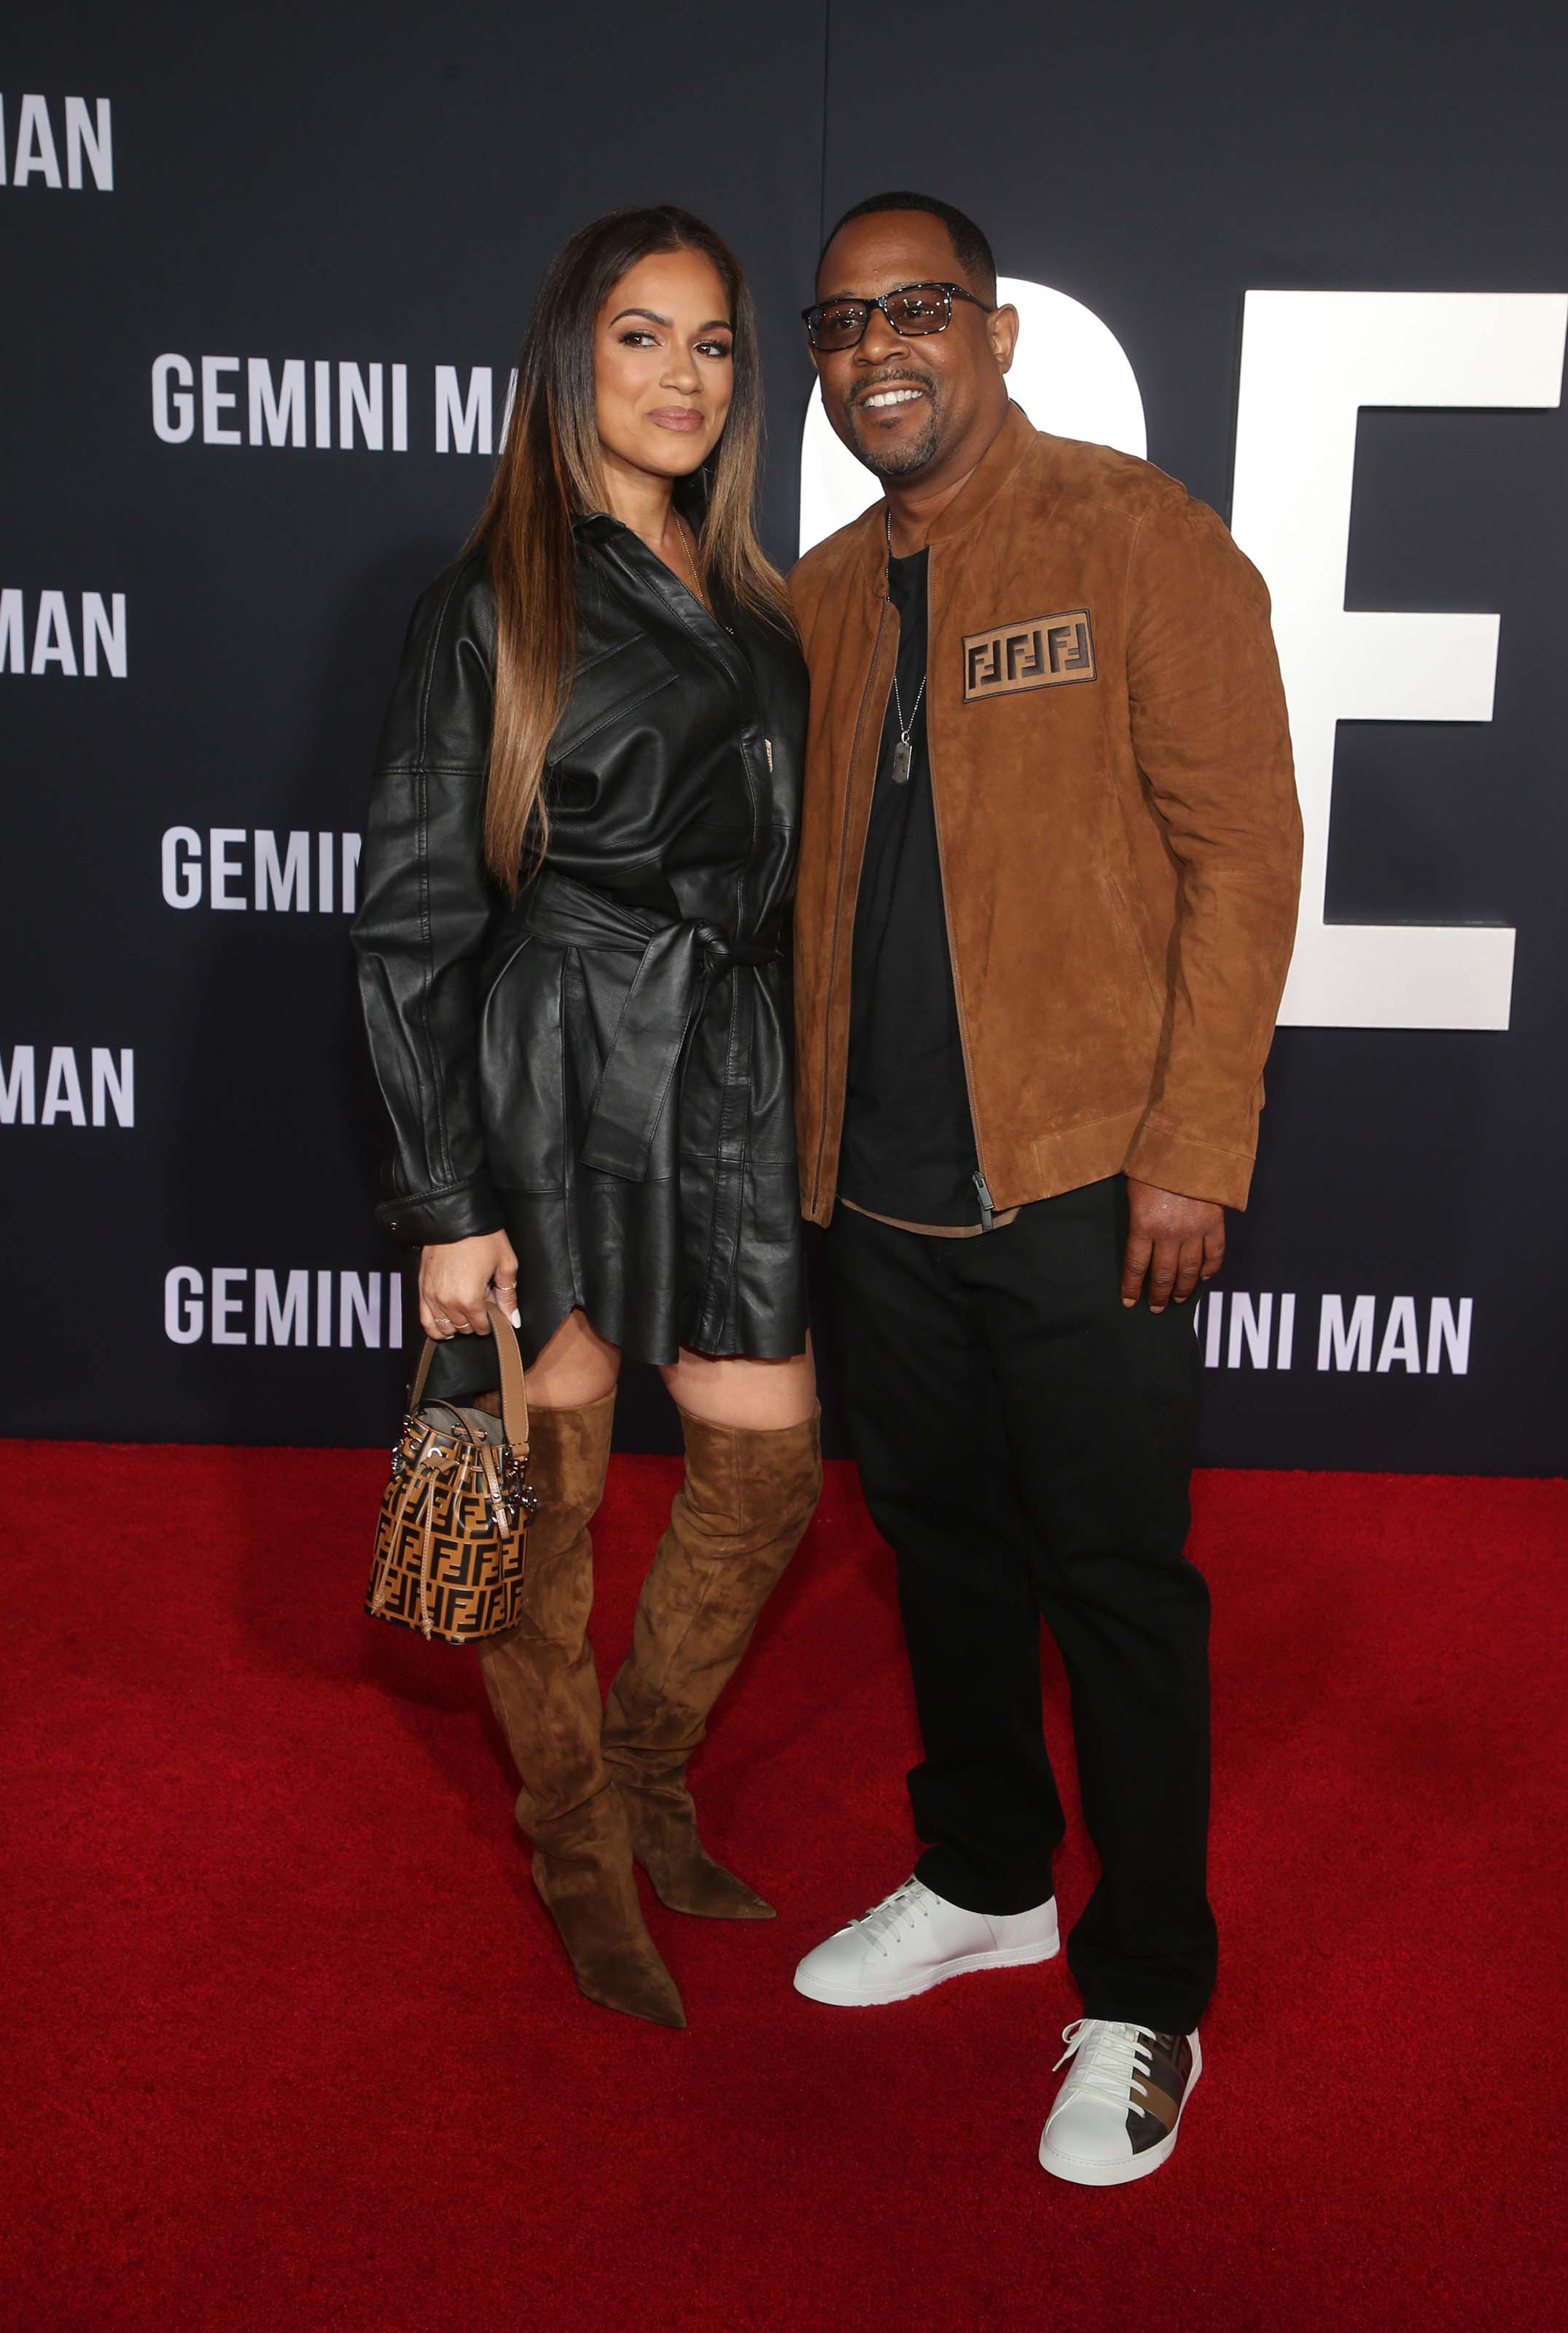 Roberta Moradfar attends Gemini Man Los Angeles Premiere